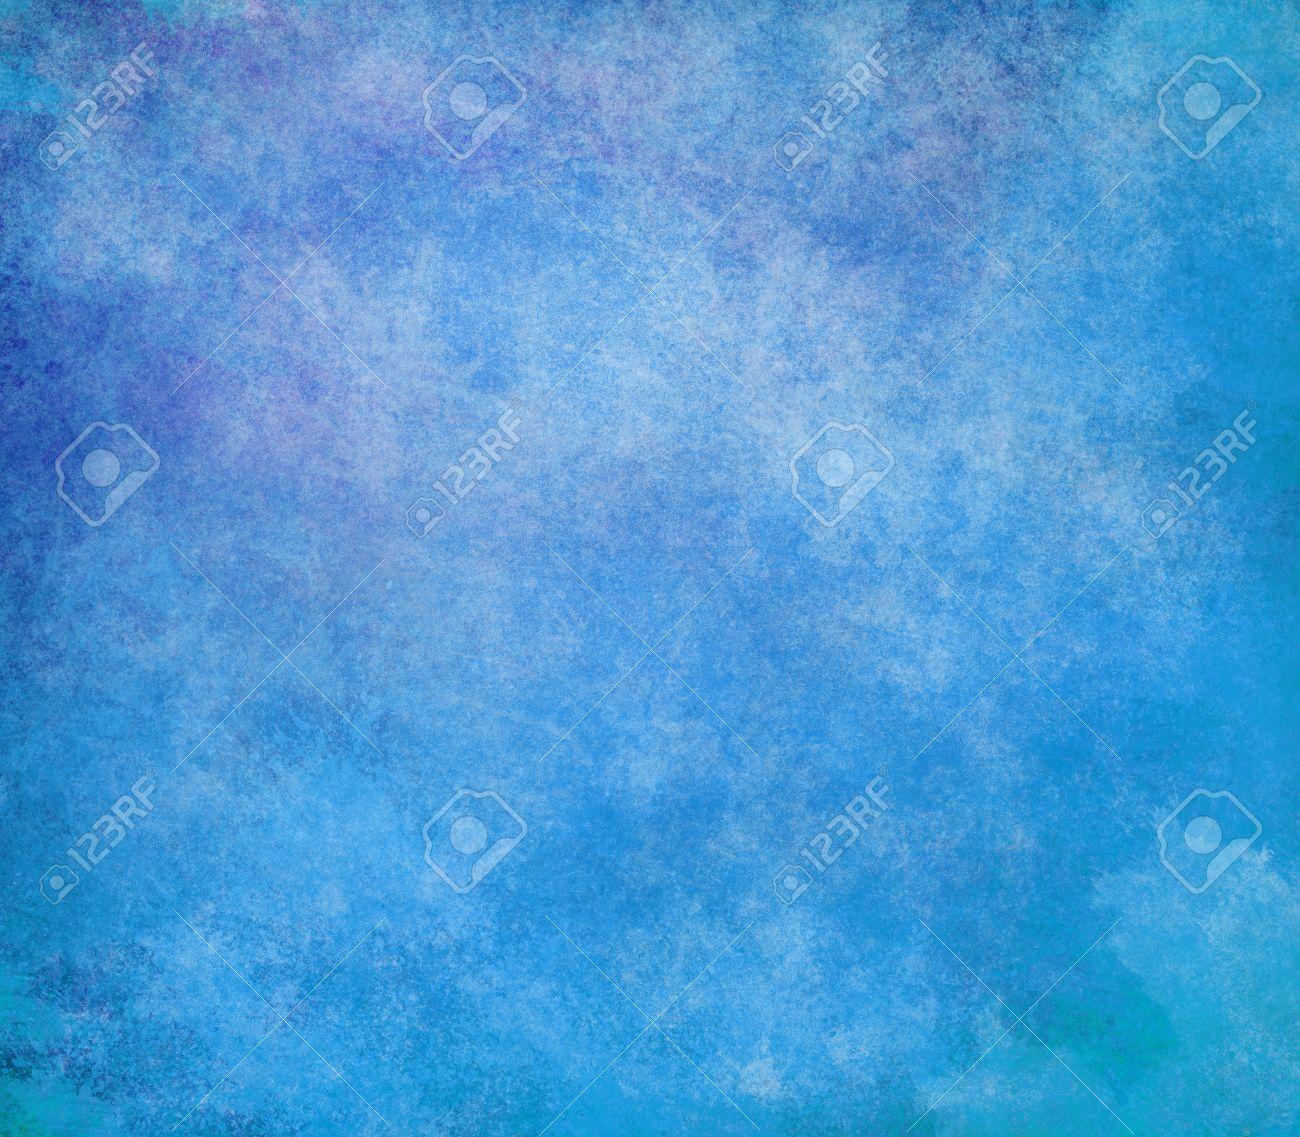 blue texture background.html